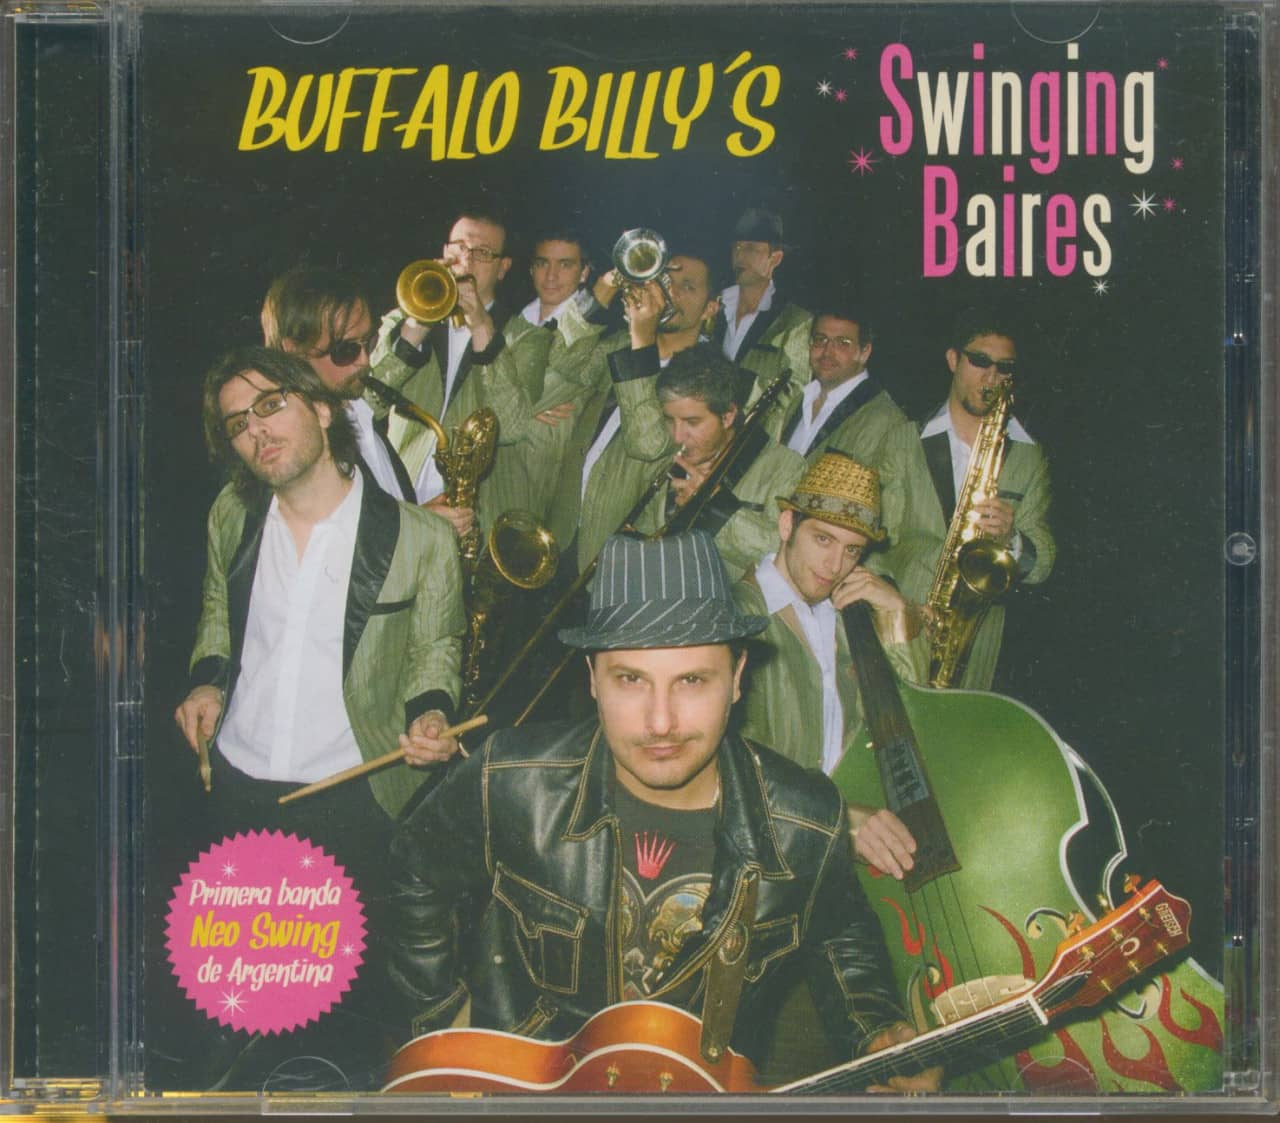 The Buffalo Billy´s - Swinging Baires (CD)